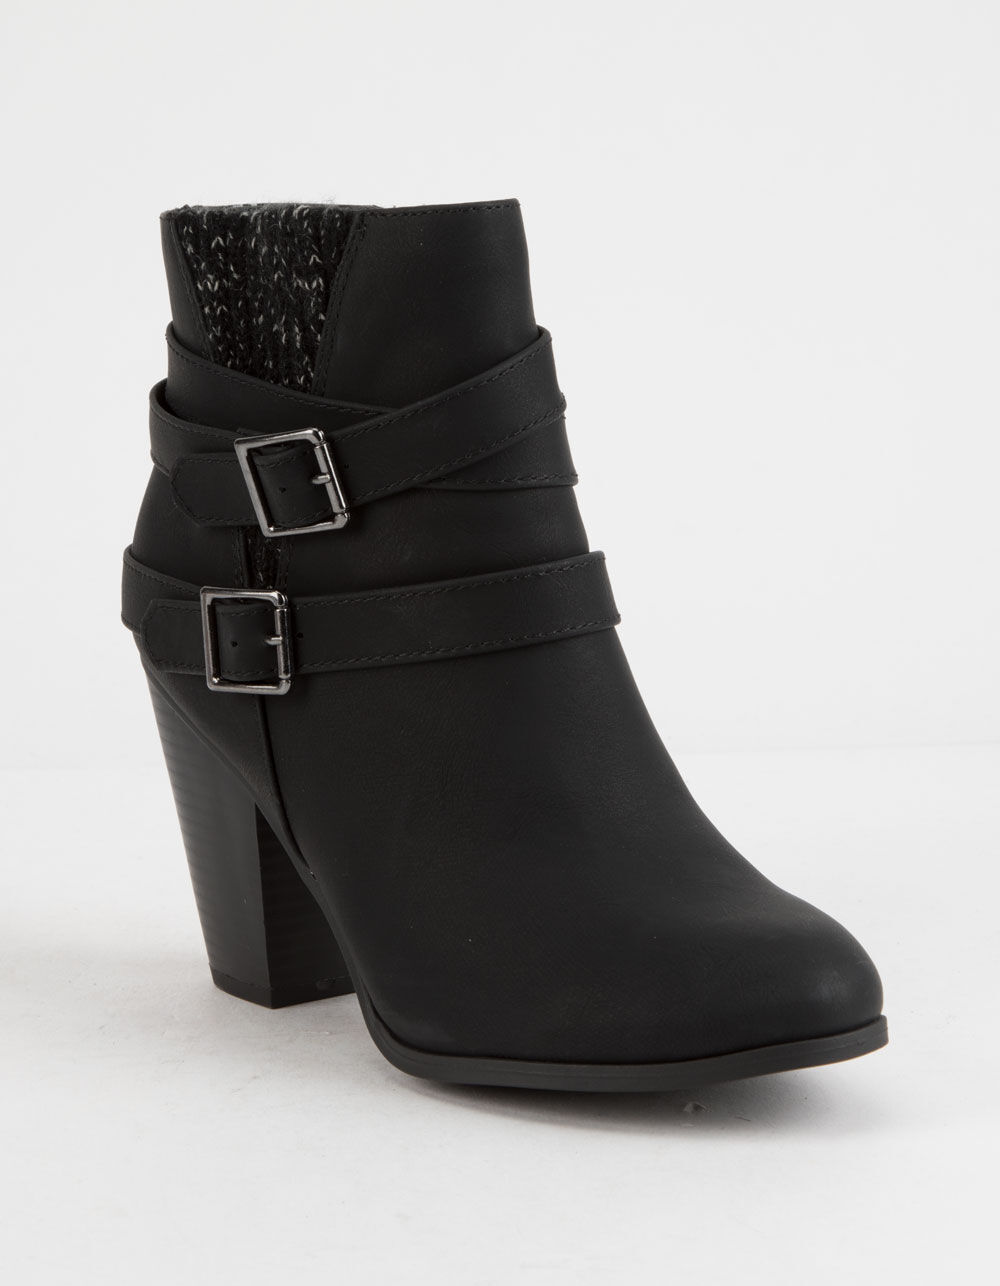 SODA Sweater Knit Block Heel Black Booties